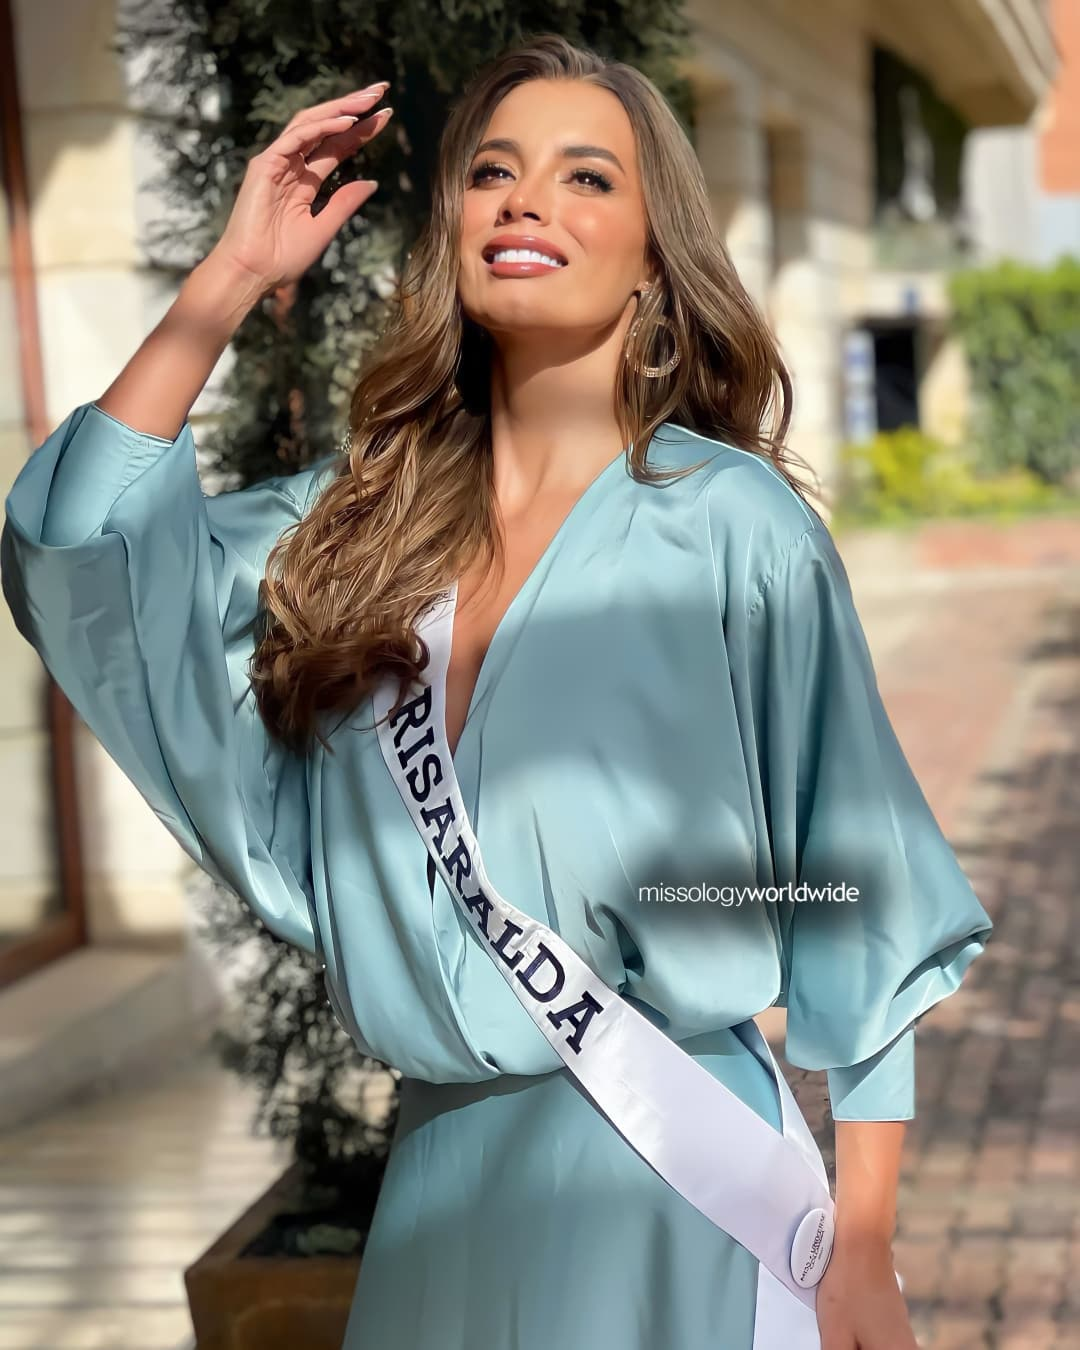 maria alejandra lopez perez, miss universe risaralda 2021/reyna hispanoamericana 2013/miss caraibes hibiscus 2014/miss colombia mundo 2015. - Página 2 23651813